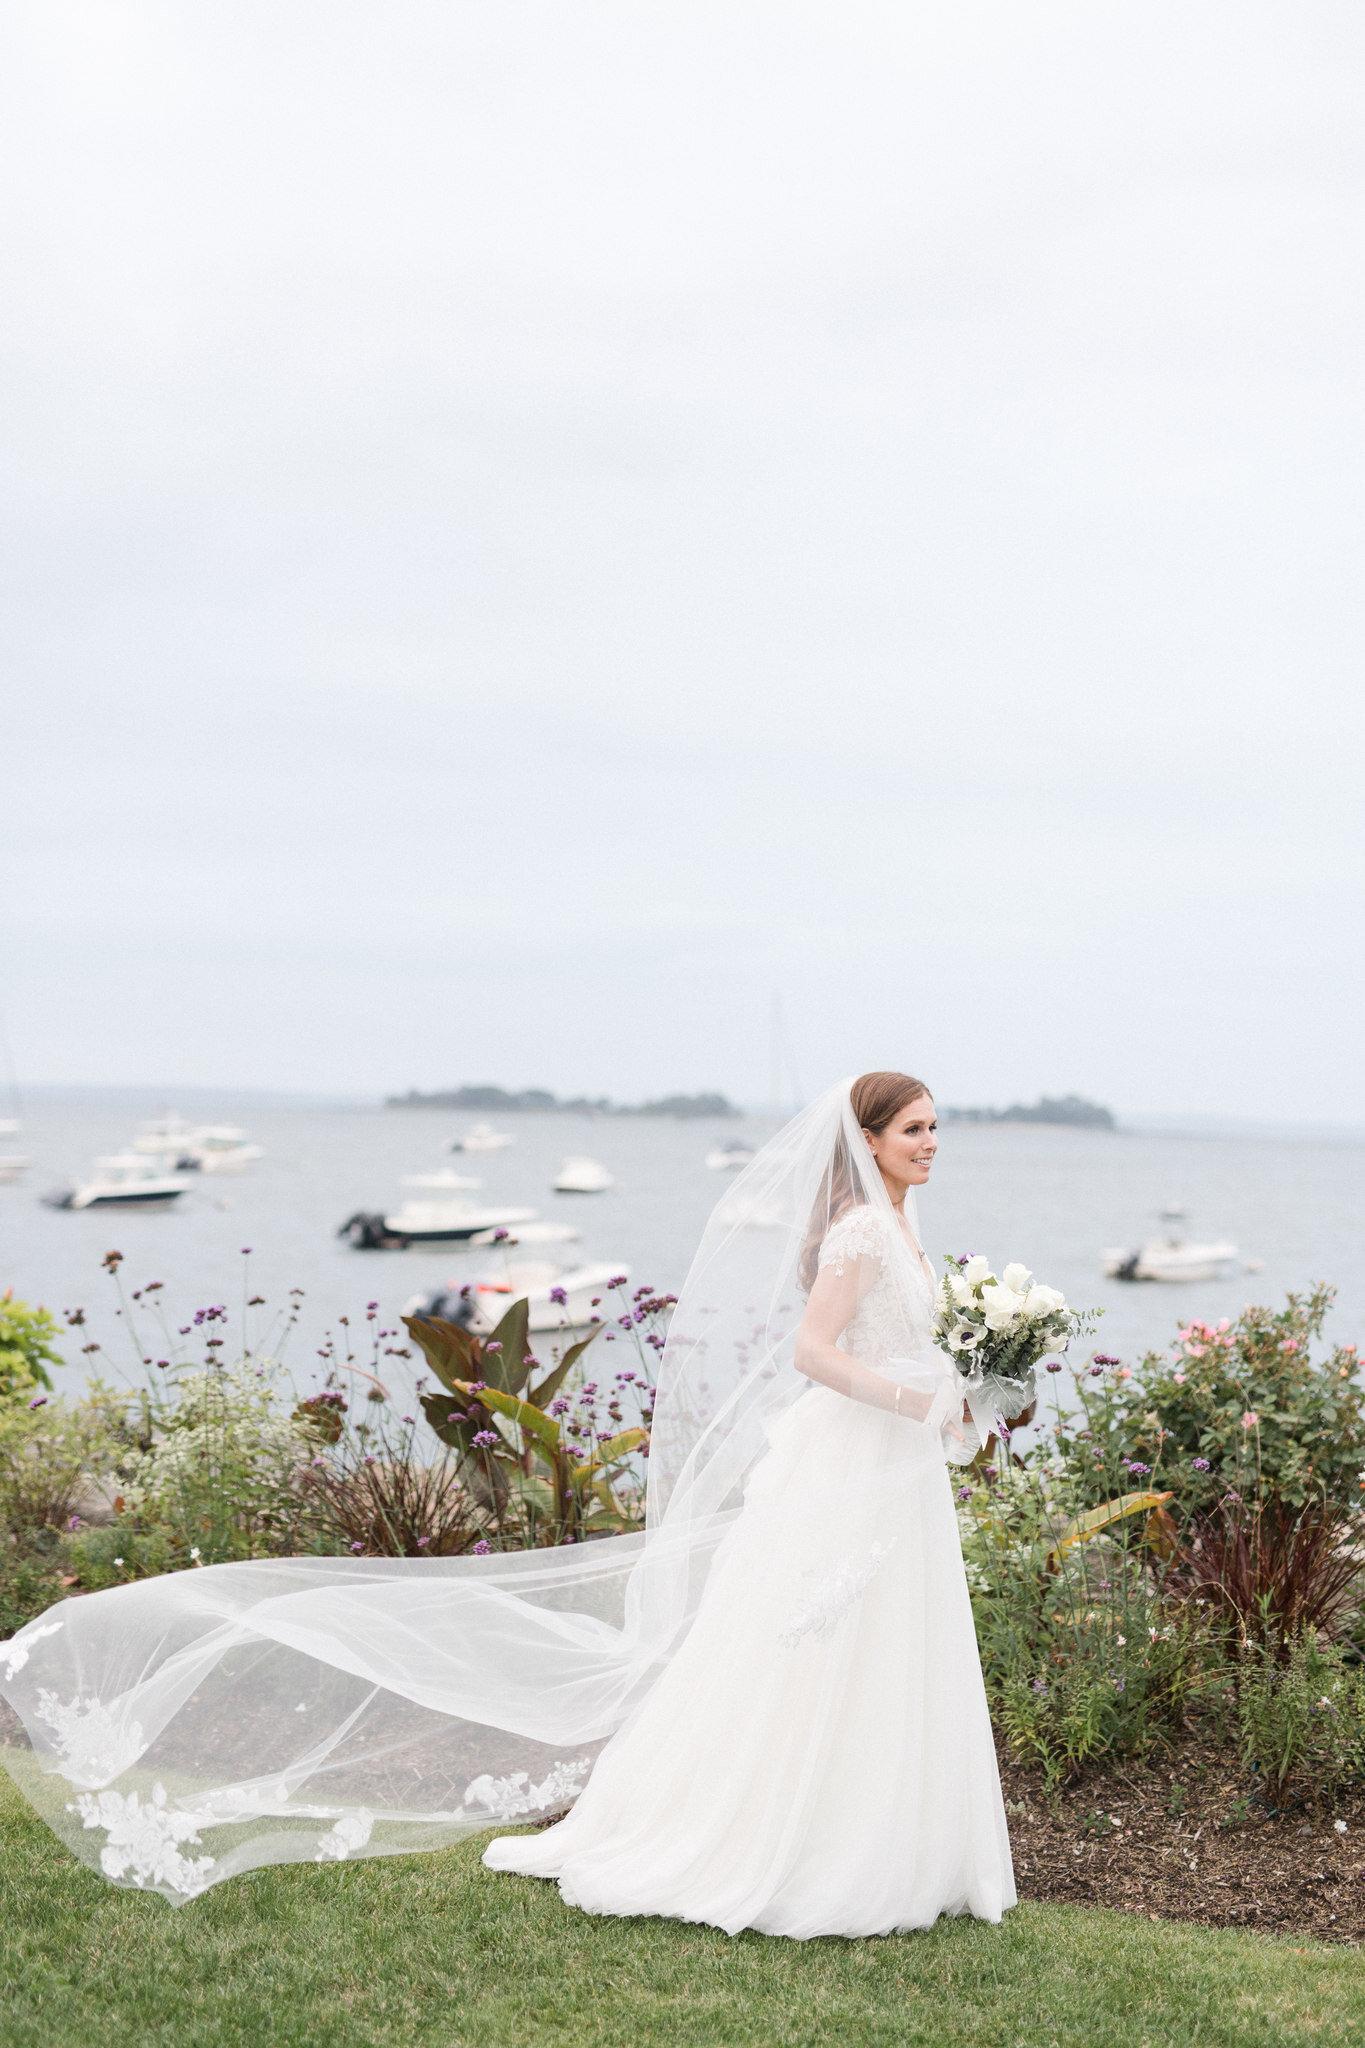 greenwich wedding_belle haven club wedding _ct wedding photographer-44_Easy-Resize.com.jpg